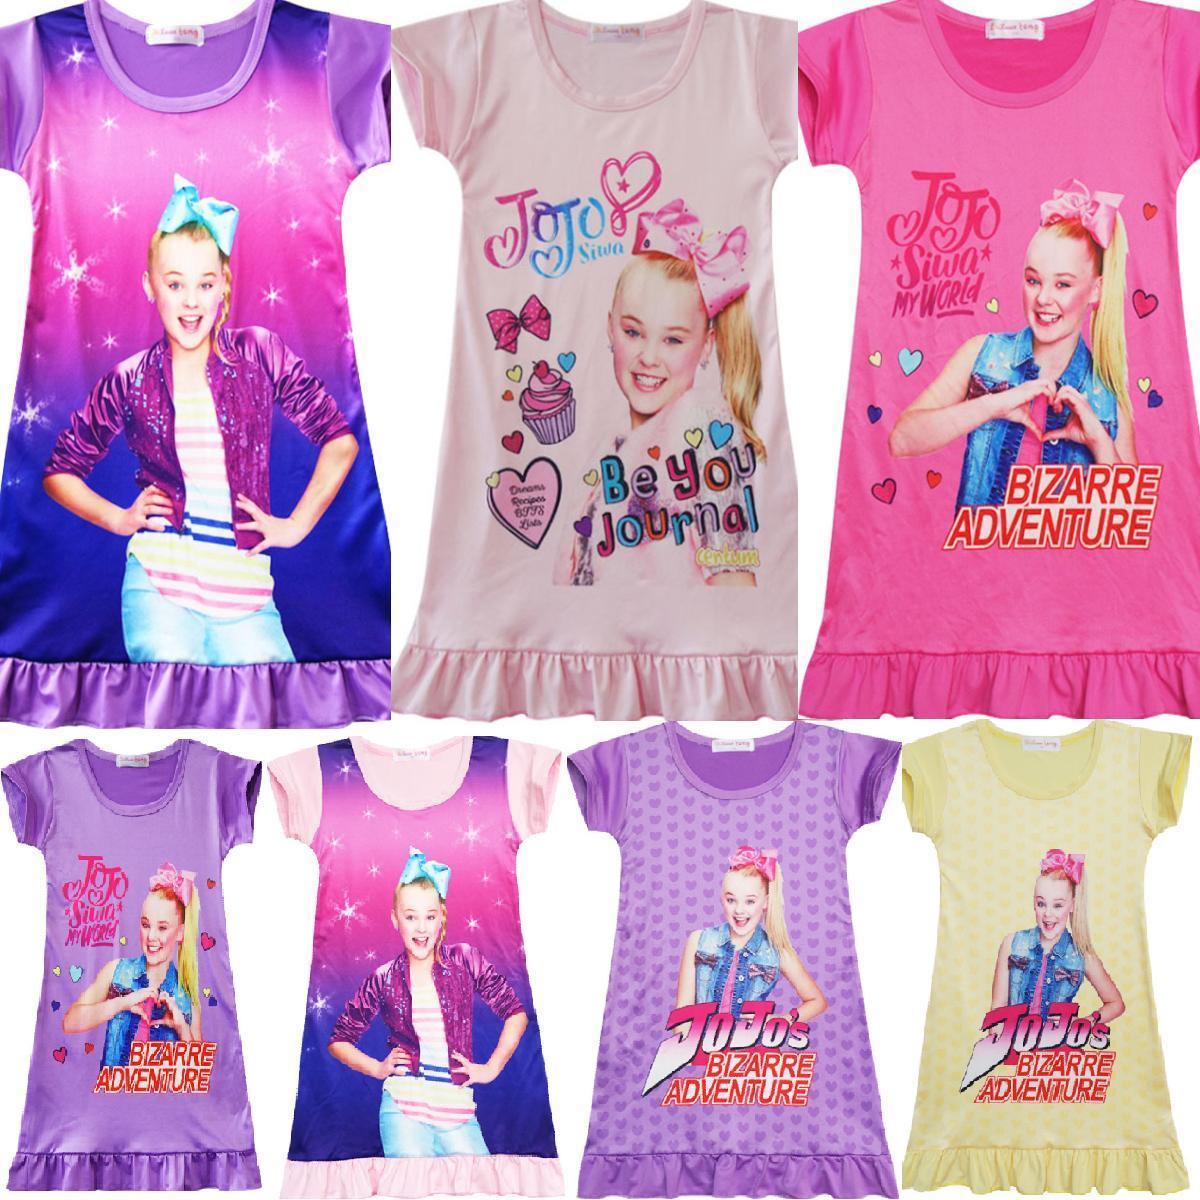 8.66 AUD - Jojo Siwa Girls Dresses Nightwear Nightdress Pyjamas Skirts Tops  Tshirts Party A  ebay  Fashion 6f7d85949147